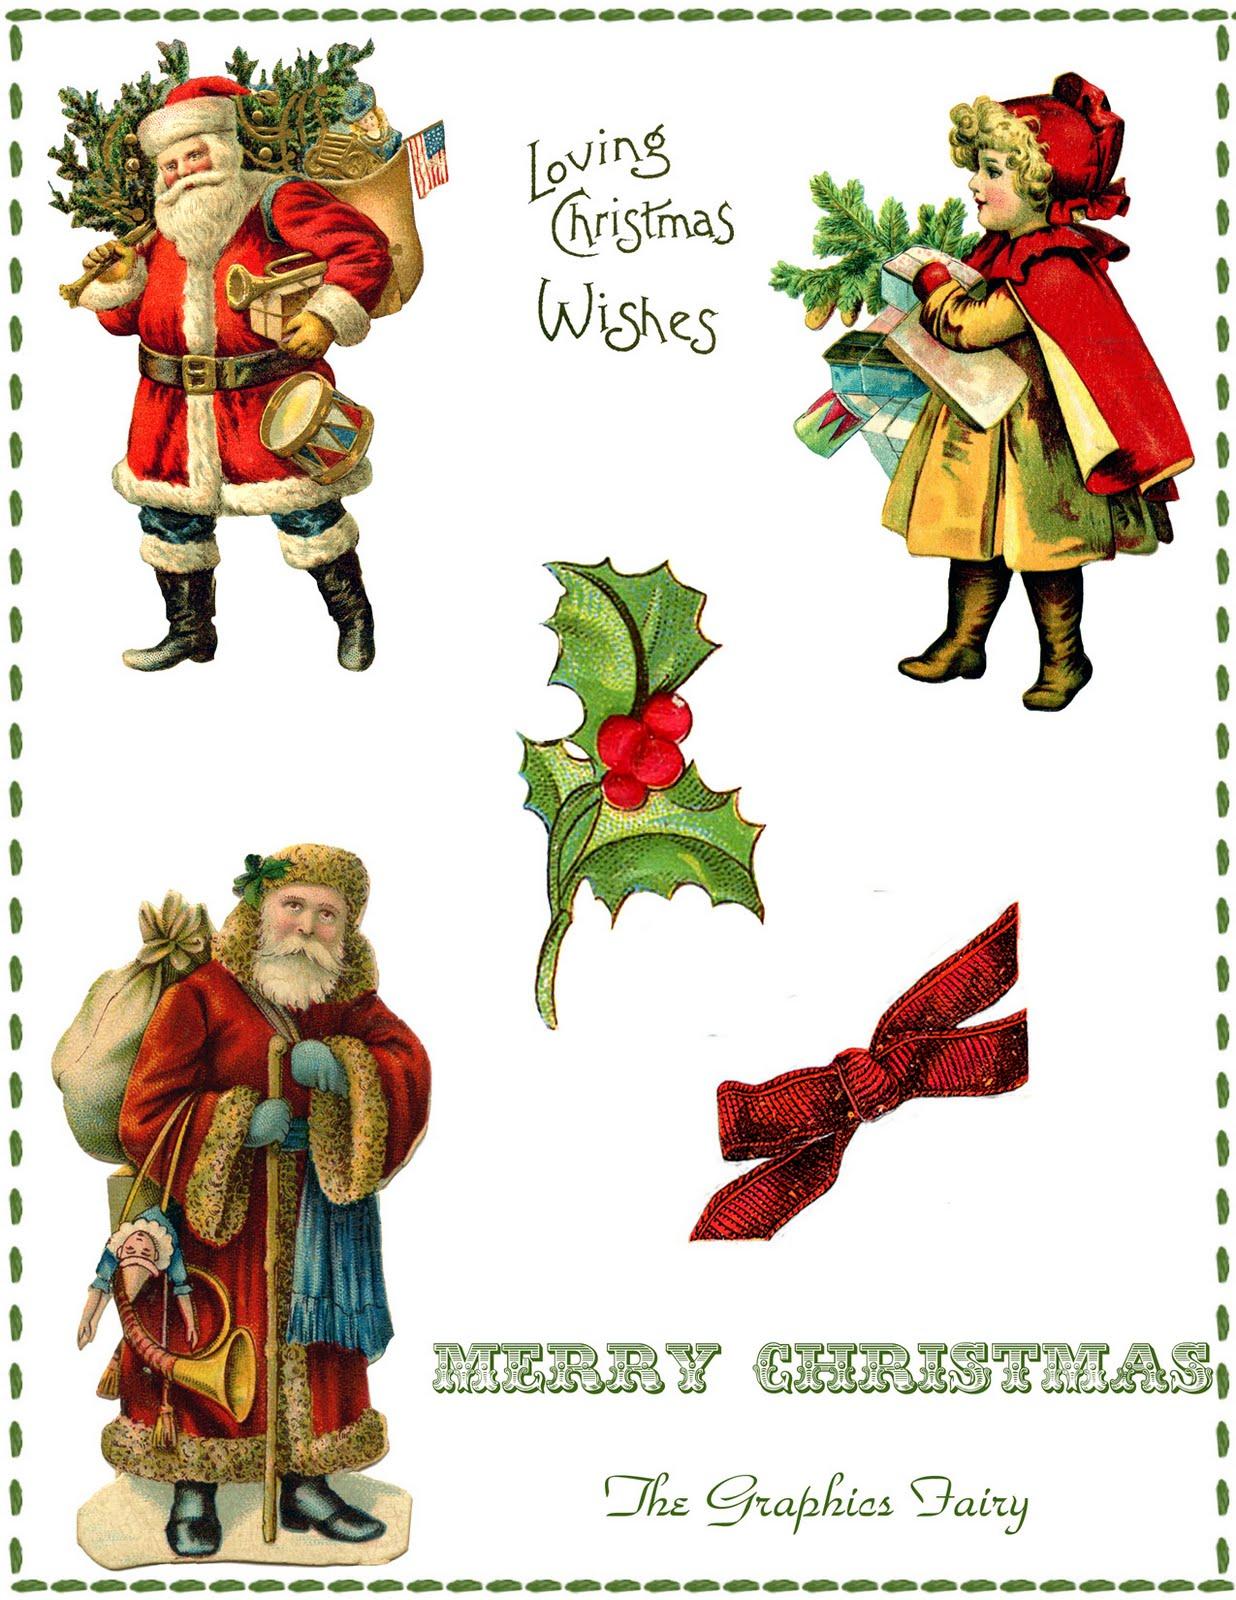 Vintage Christmas Collage Printable - The Graphics Fairy